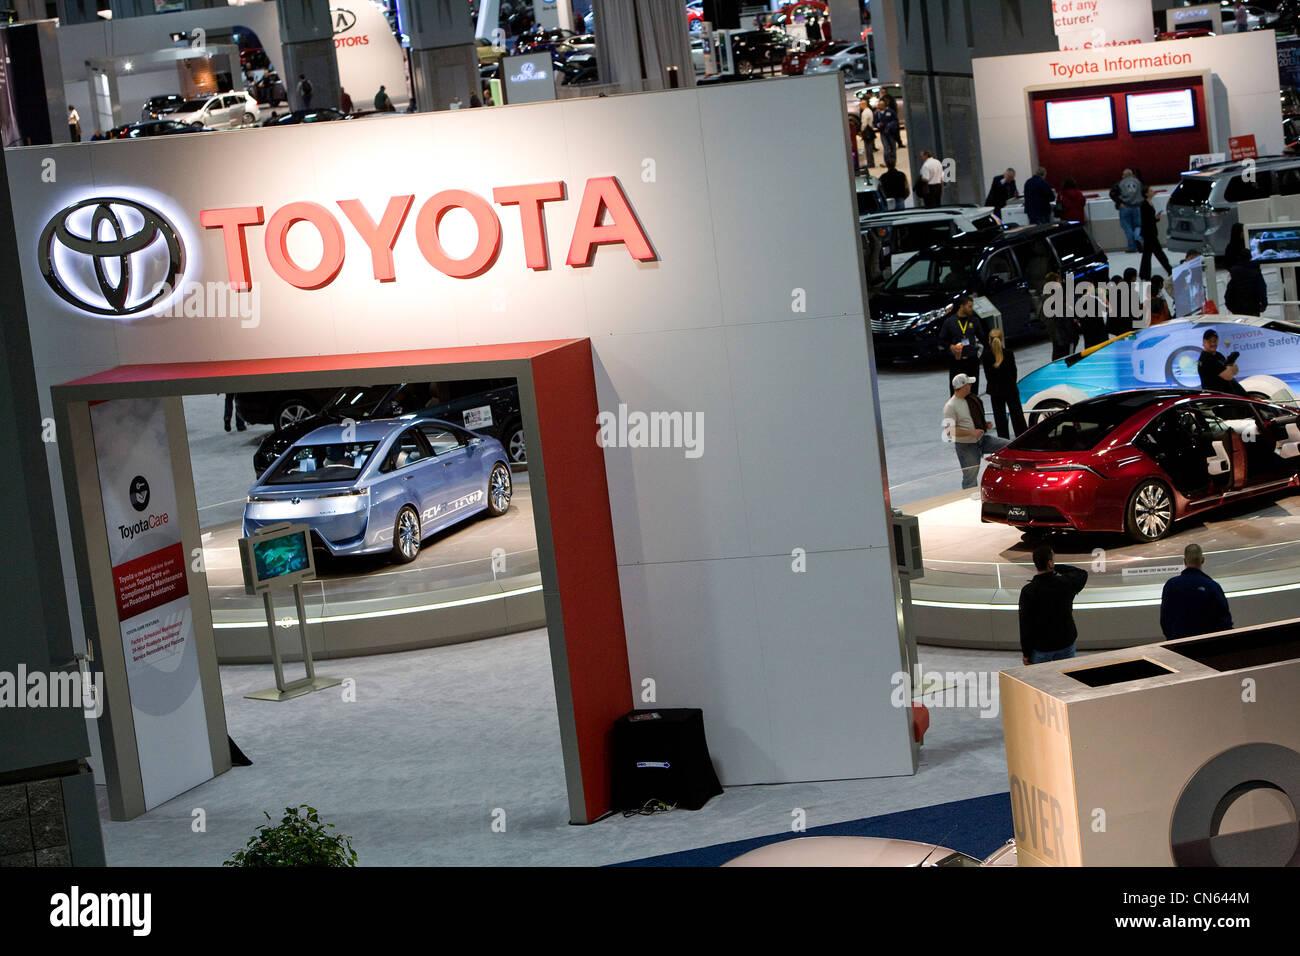 The Toyota display at the 2012 Washington Auto Show. - Stock Image